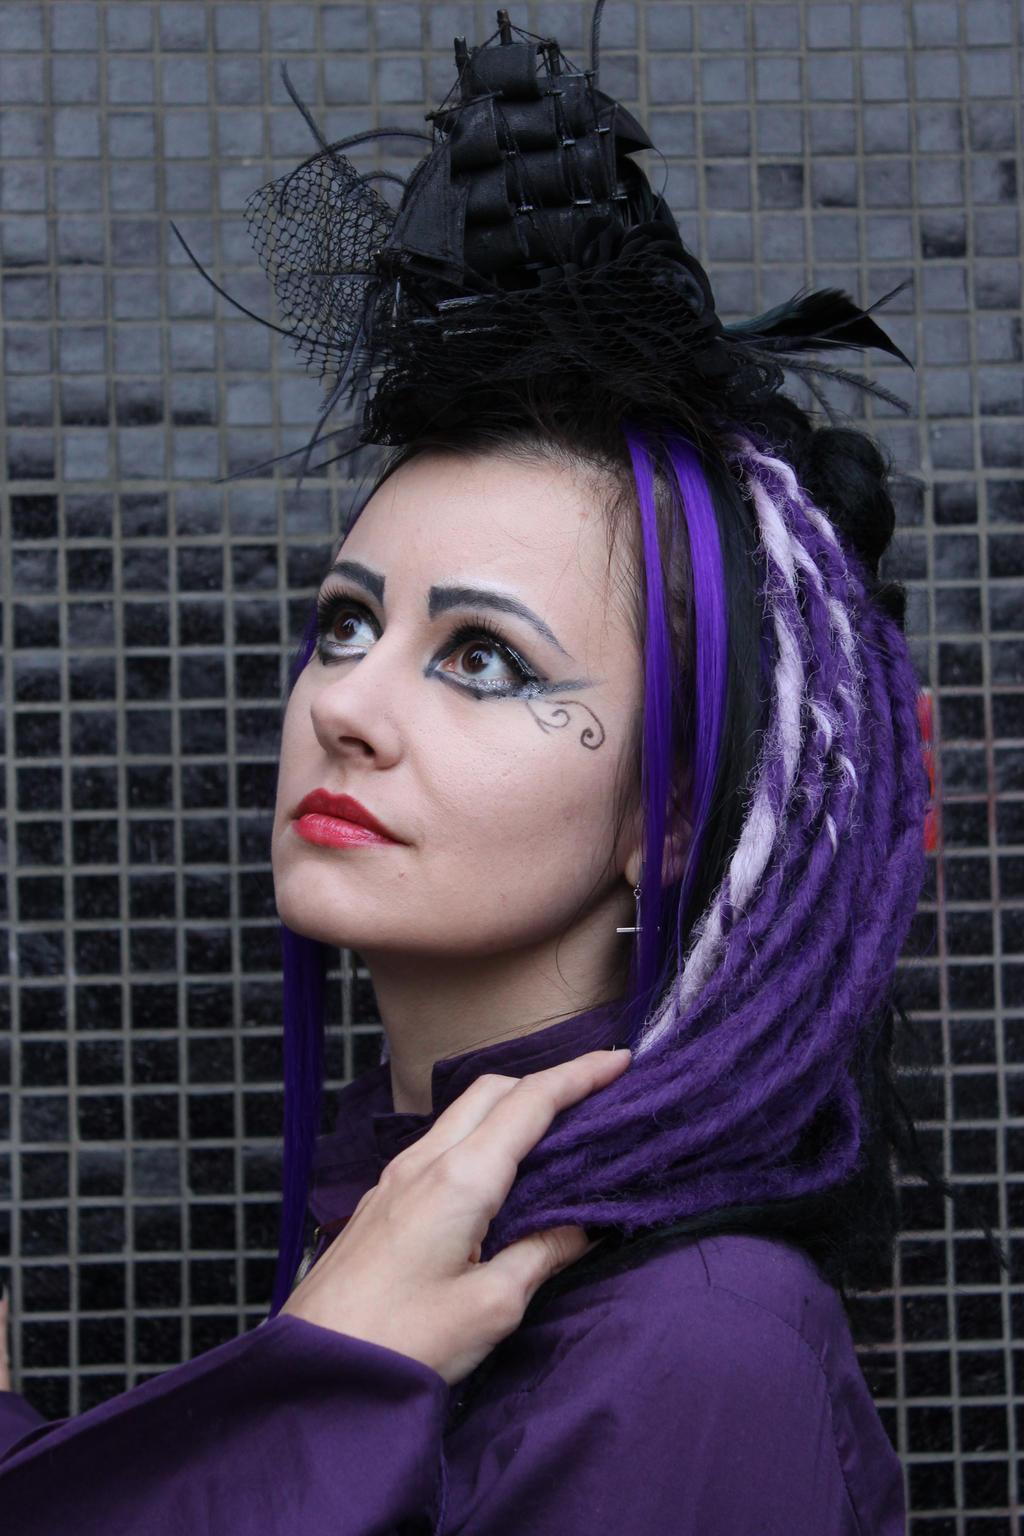 purple dreadlocks 01 by Anna-LovelyMonster